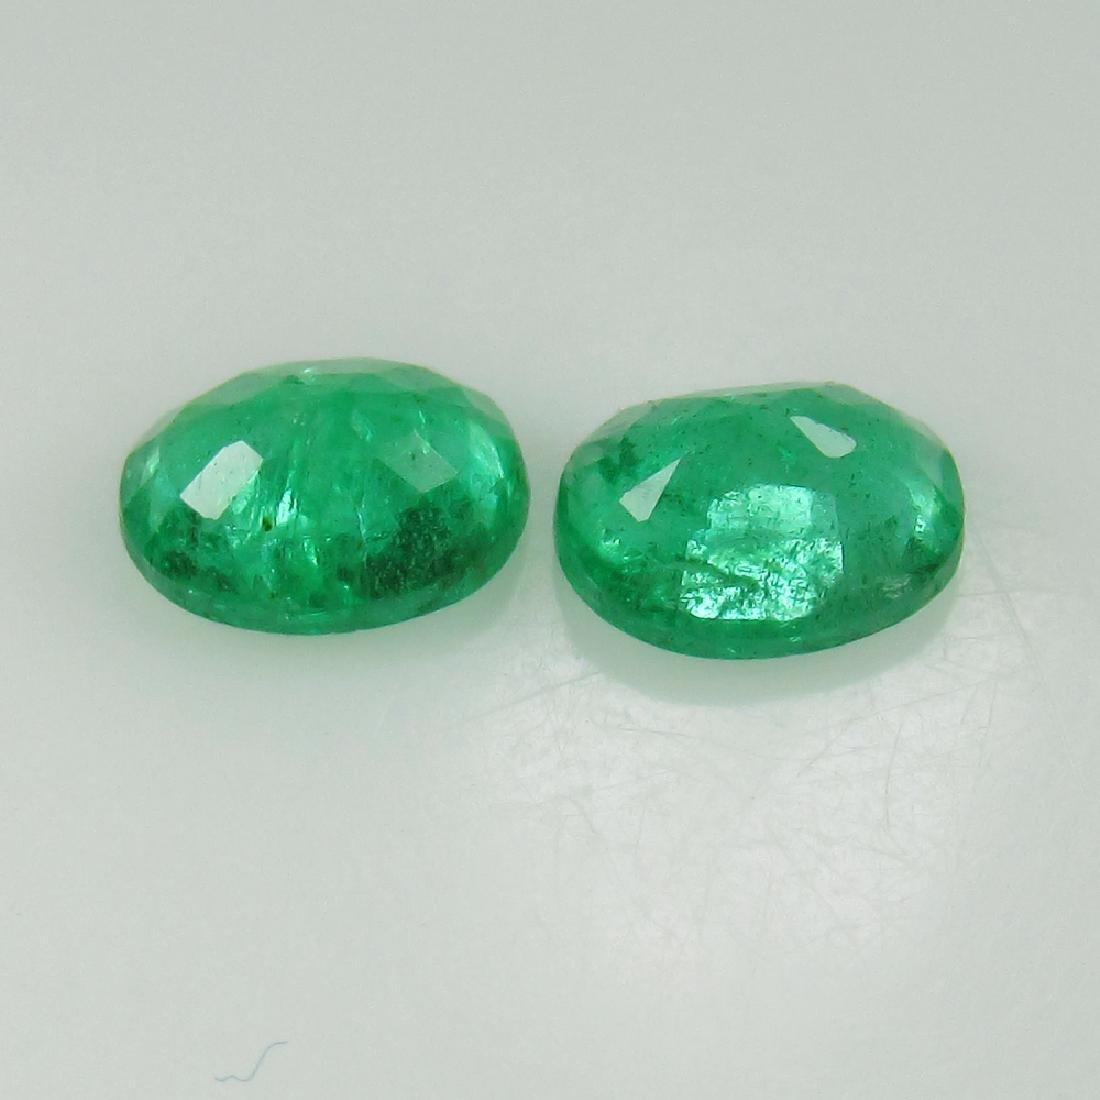 0.62 Ct Genuine Zambian Emerald Oval Pair - 2